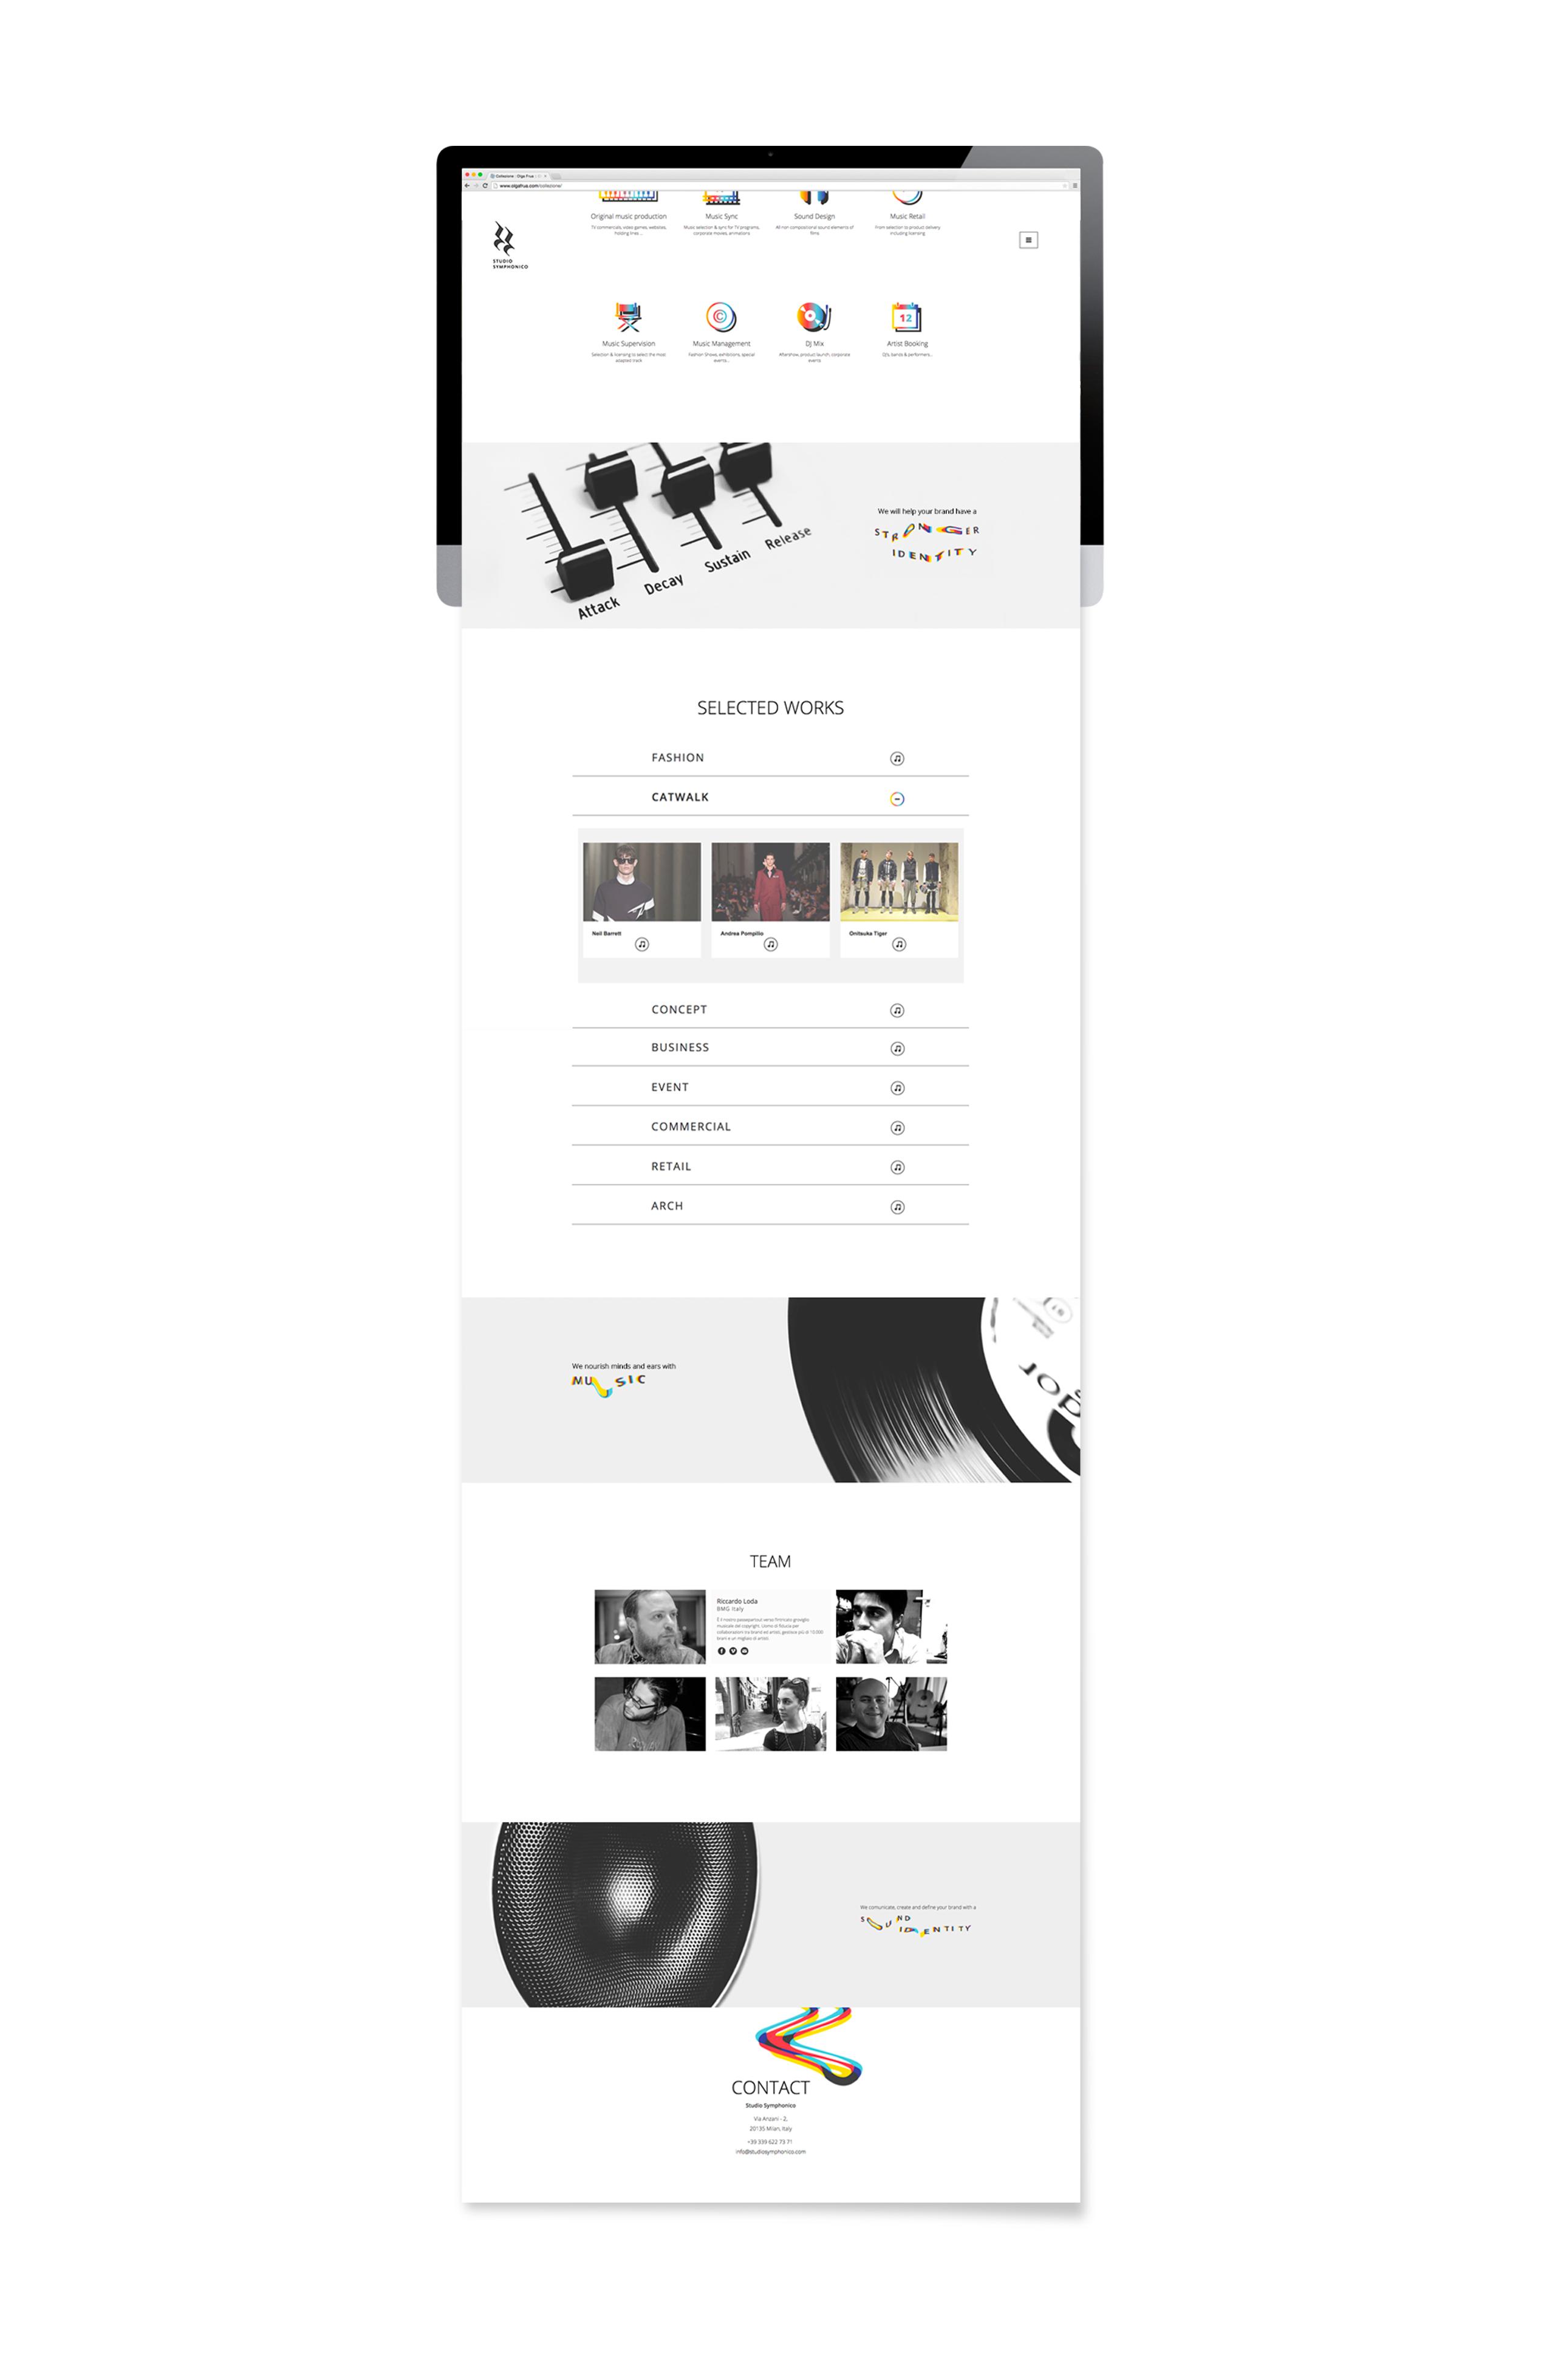 9_monitor-ok-mac_symphonico_drogheria_studio